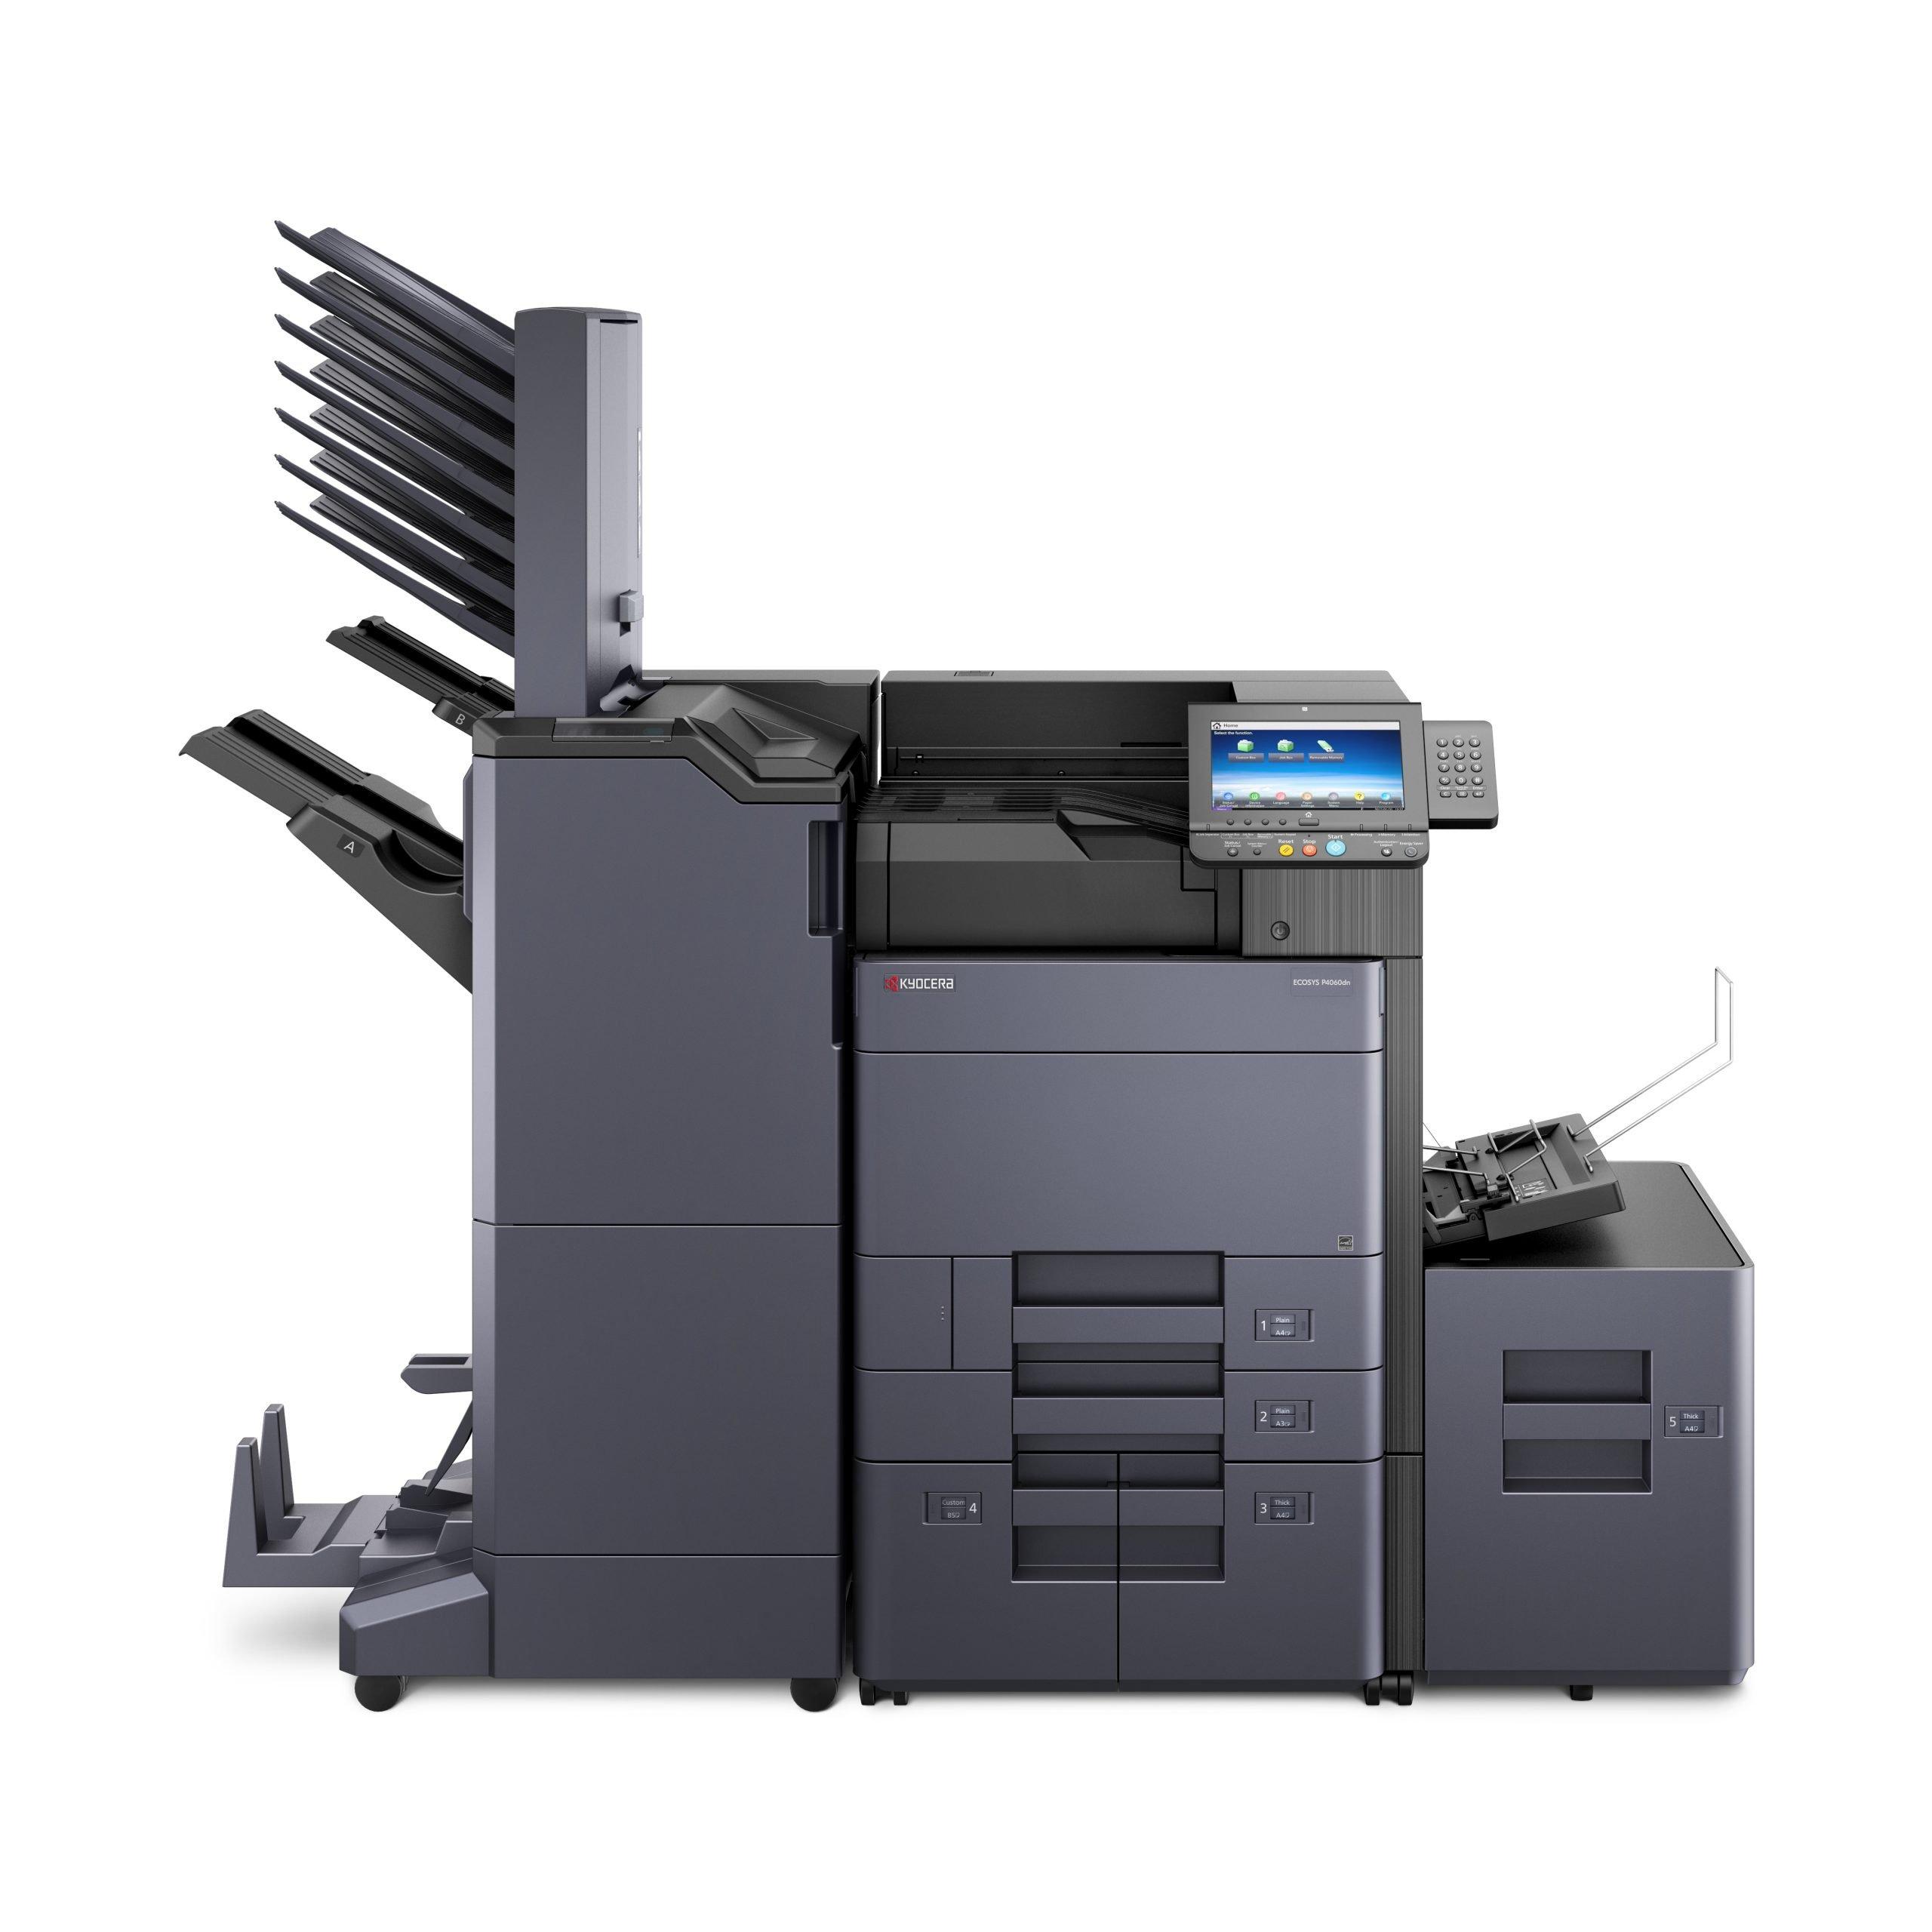 Kyocera P4060dn printer